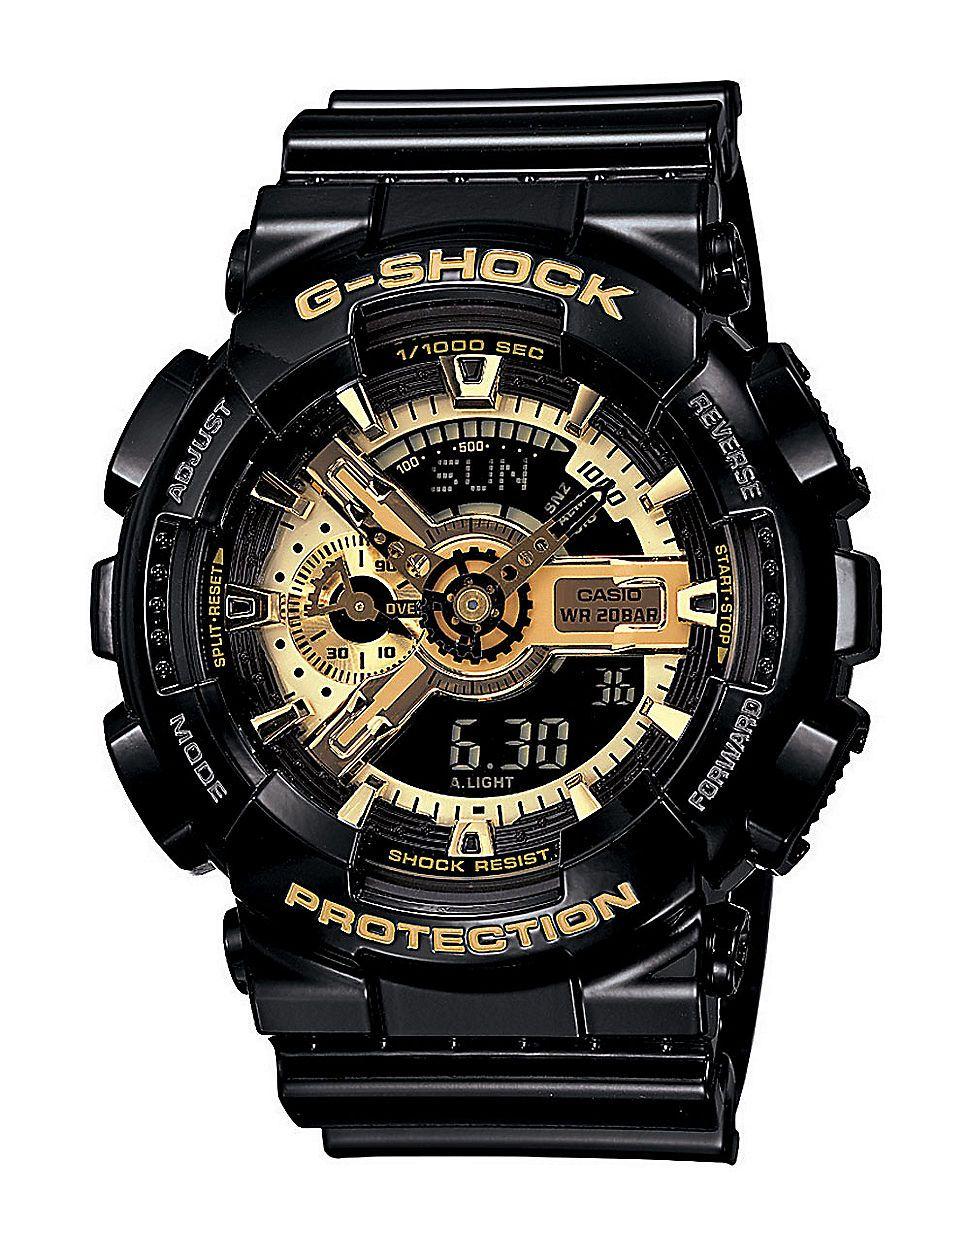 8c5200baa72cc3 Black and gold. Love it. Men's G-Shock Watch | versace, złoto ...